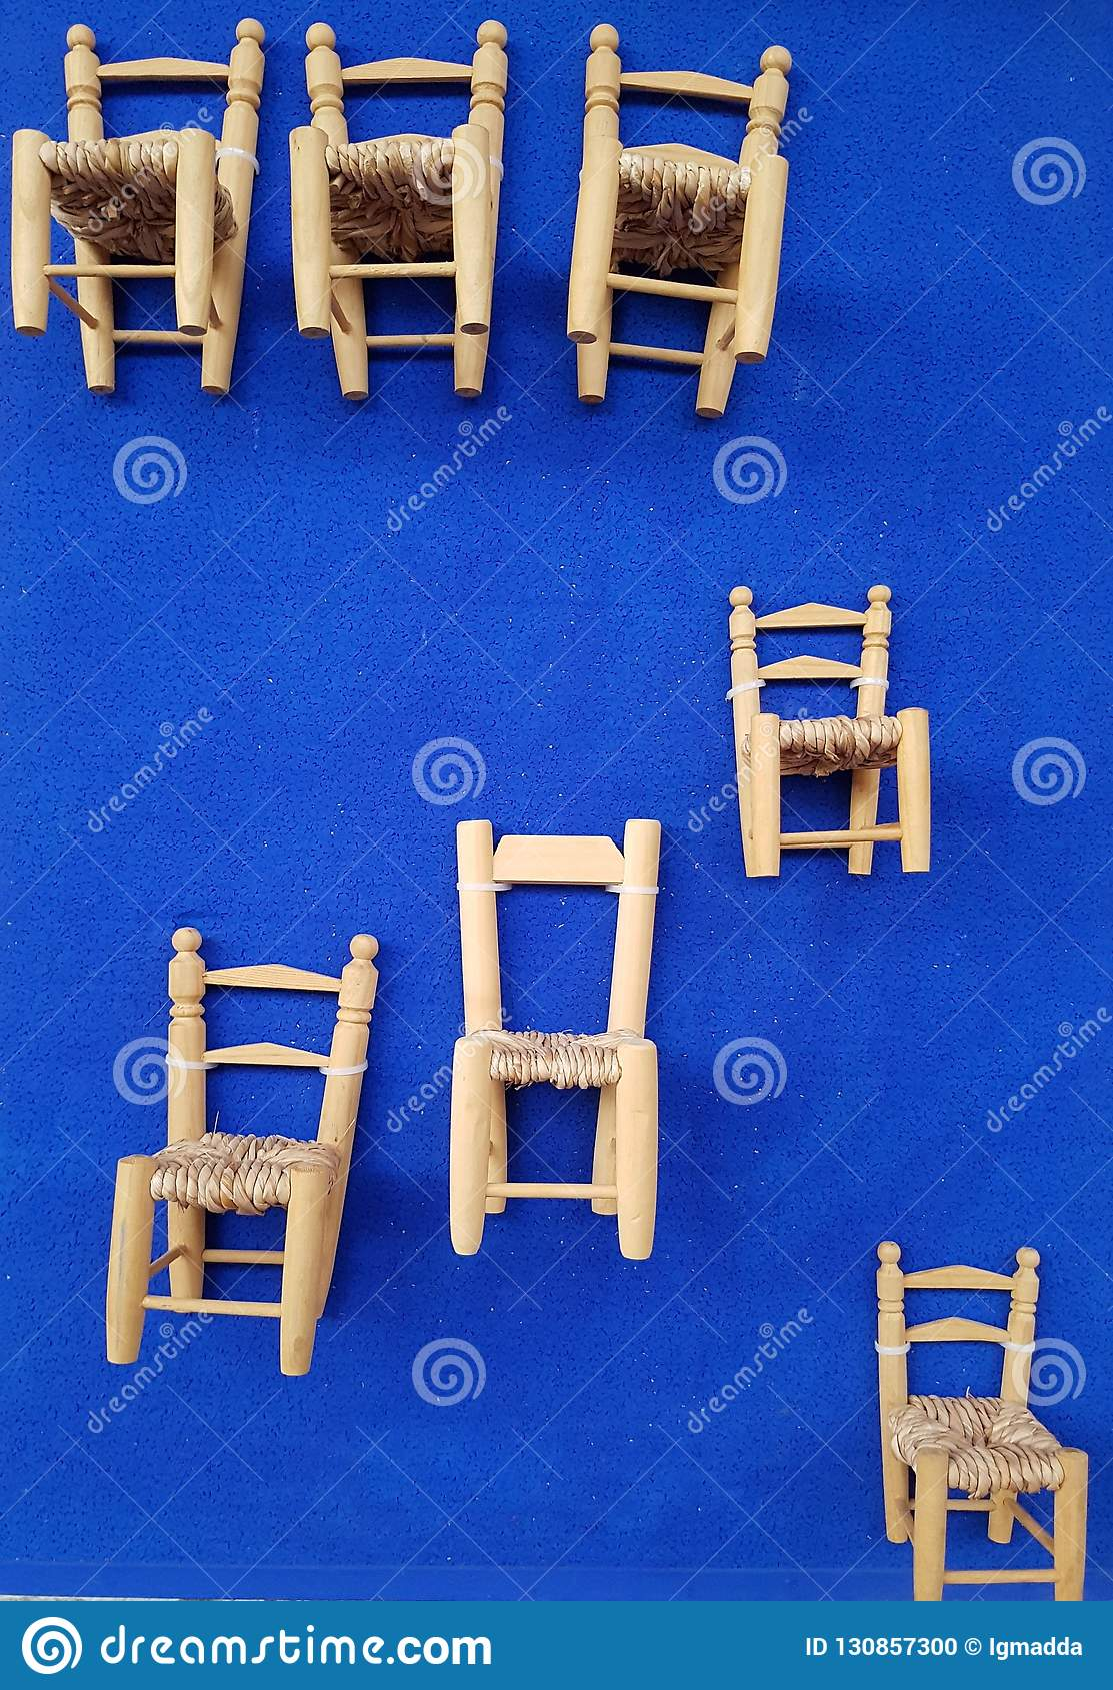 Sthle stockfoto. Bild von wand, sitz, holz   130857300